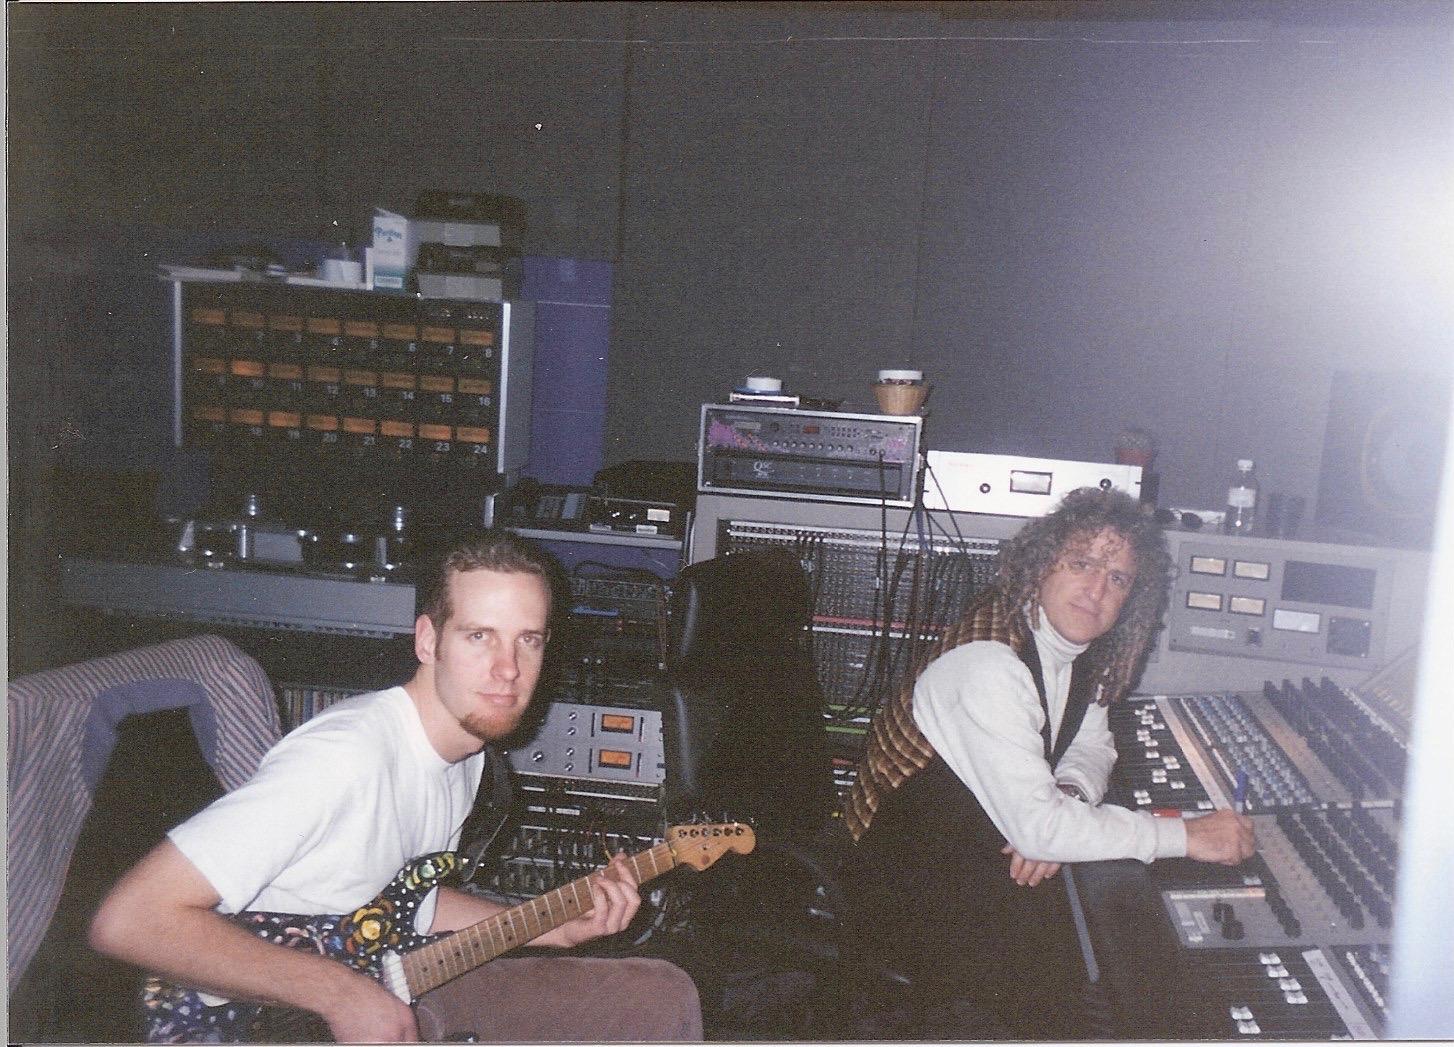 Me & Mathew Wilder - 1994?